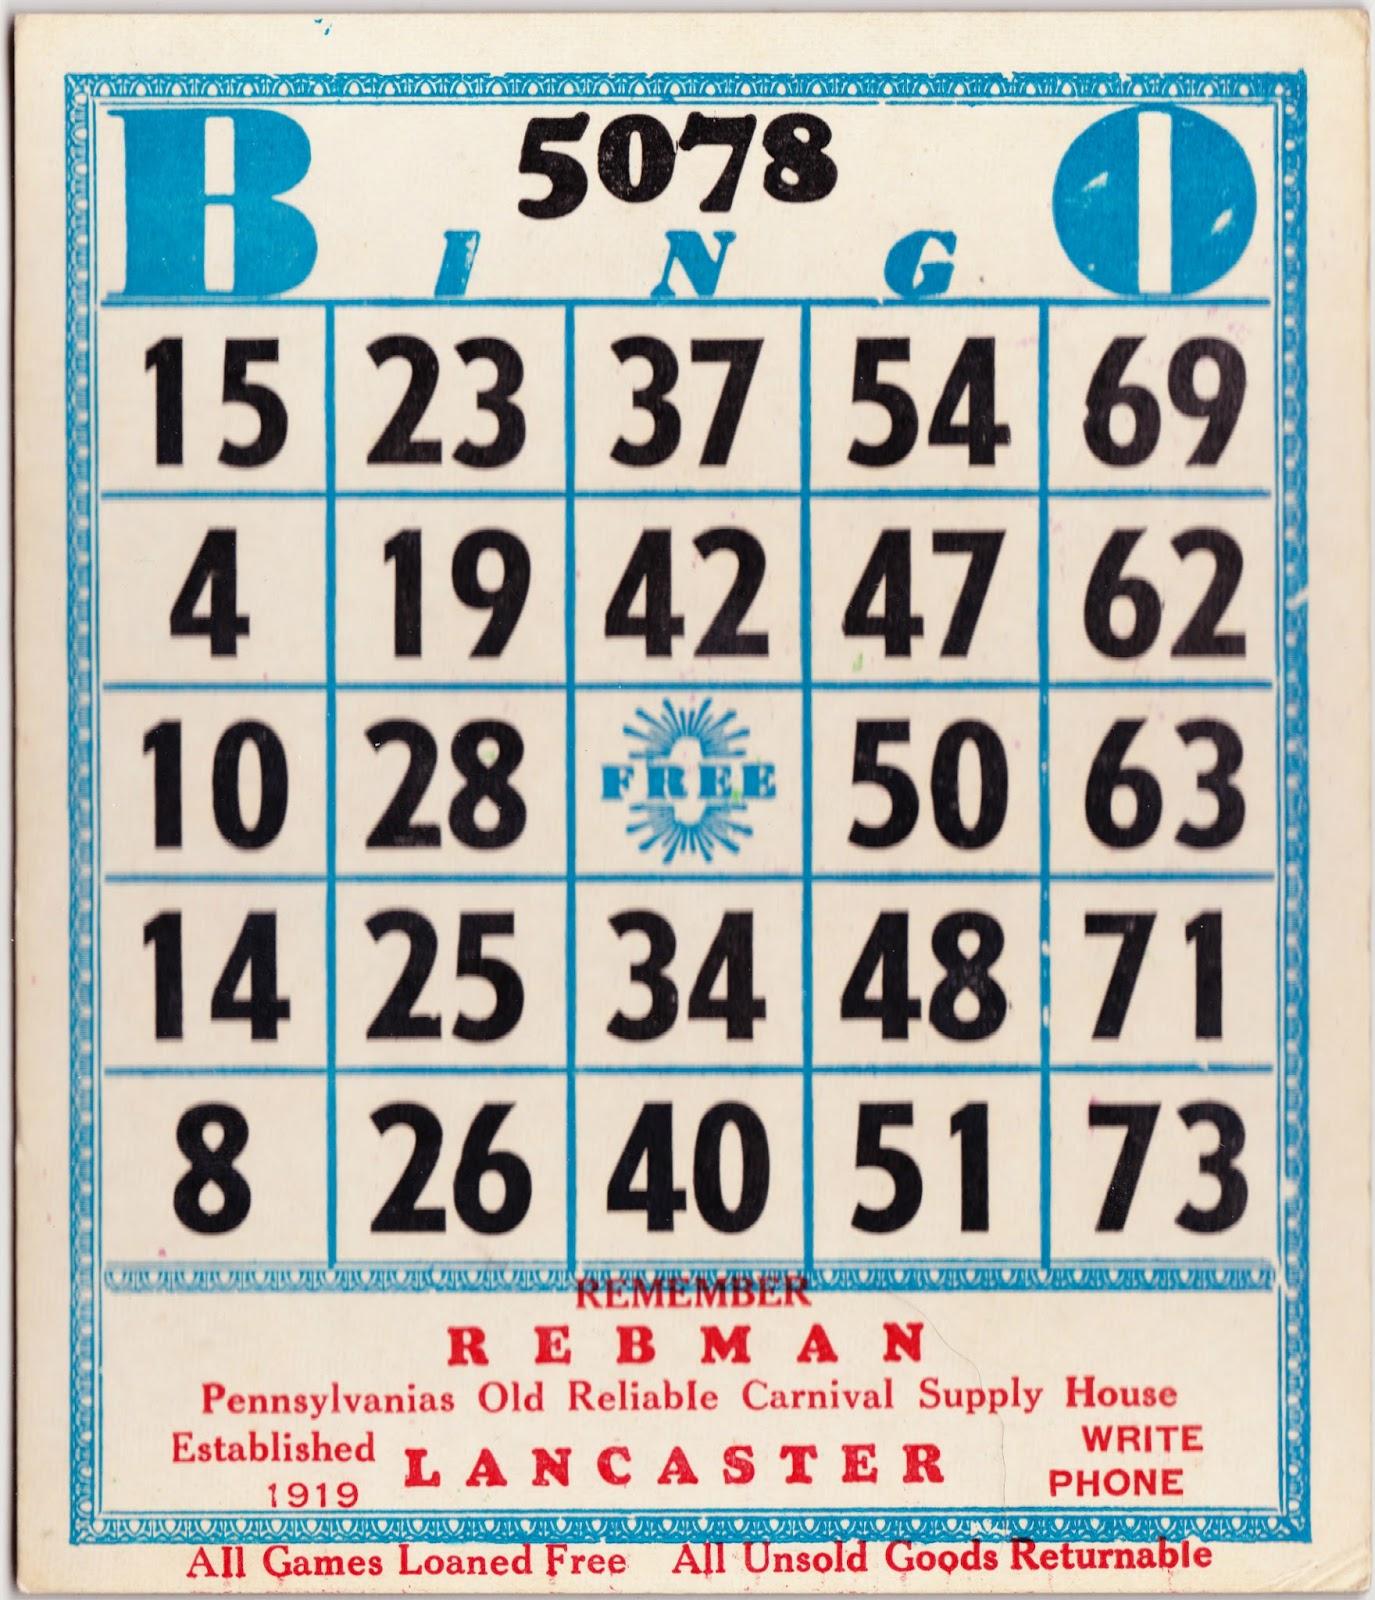 4x4 bingo template.html